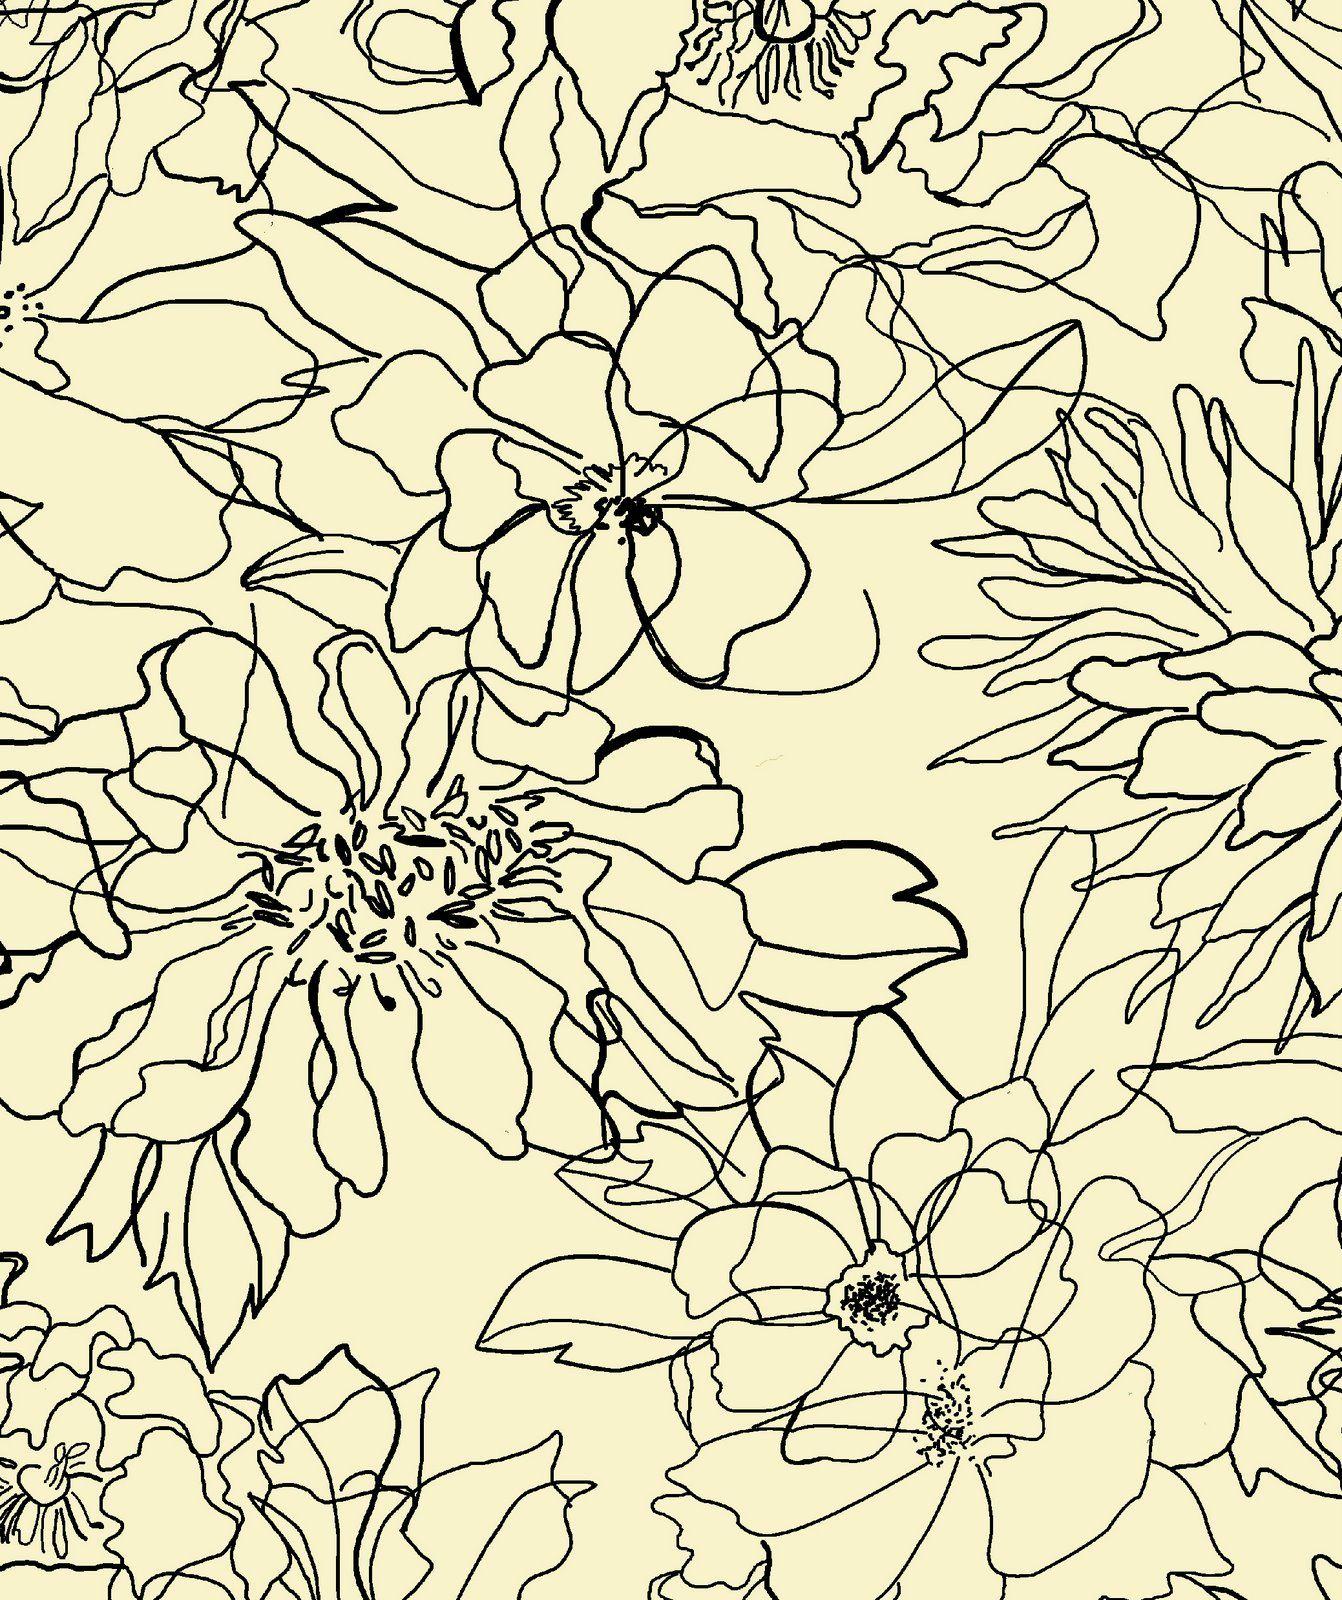 Floral Sketch textile print   Patterns Galore in 2019   Prints ... 4b251448ed2